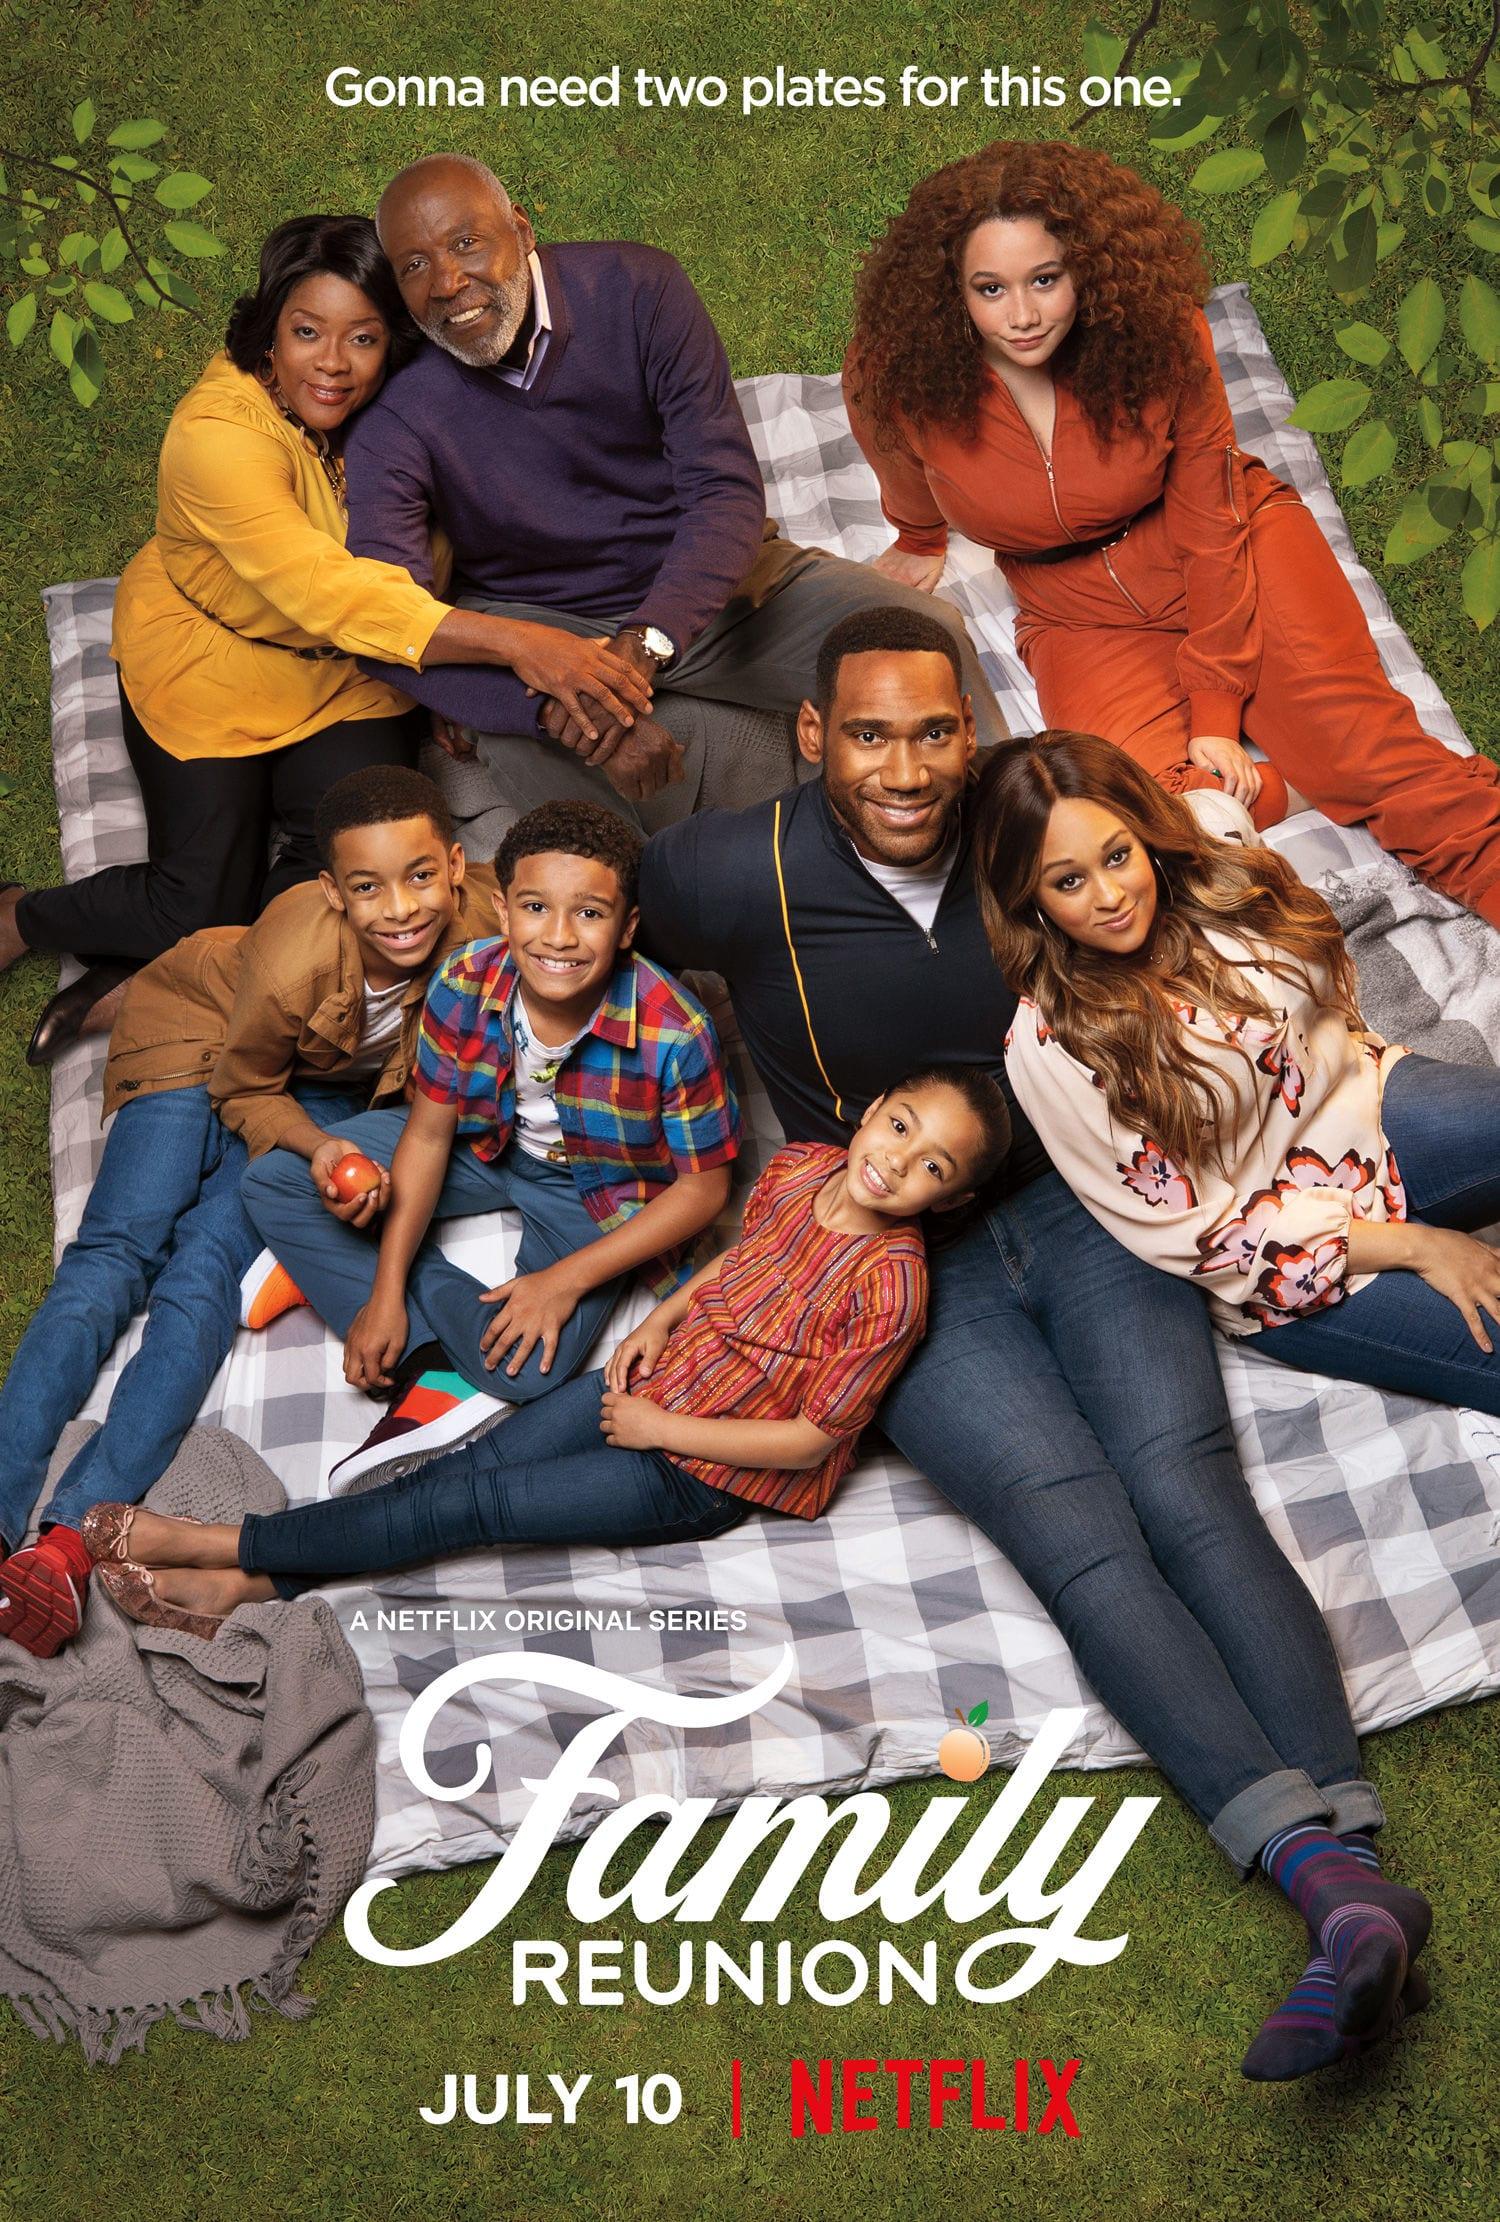 Family Reunion teaser image